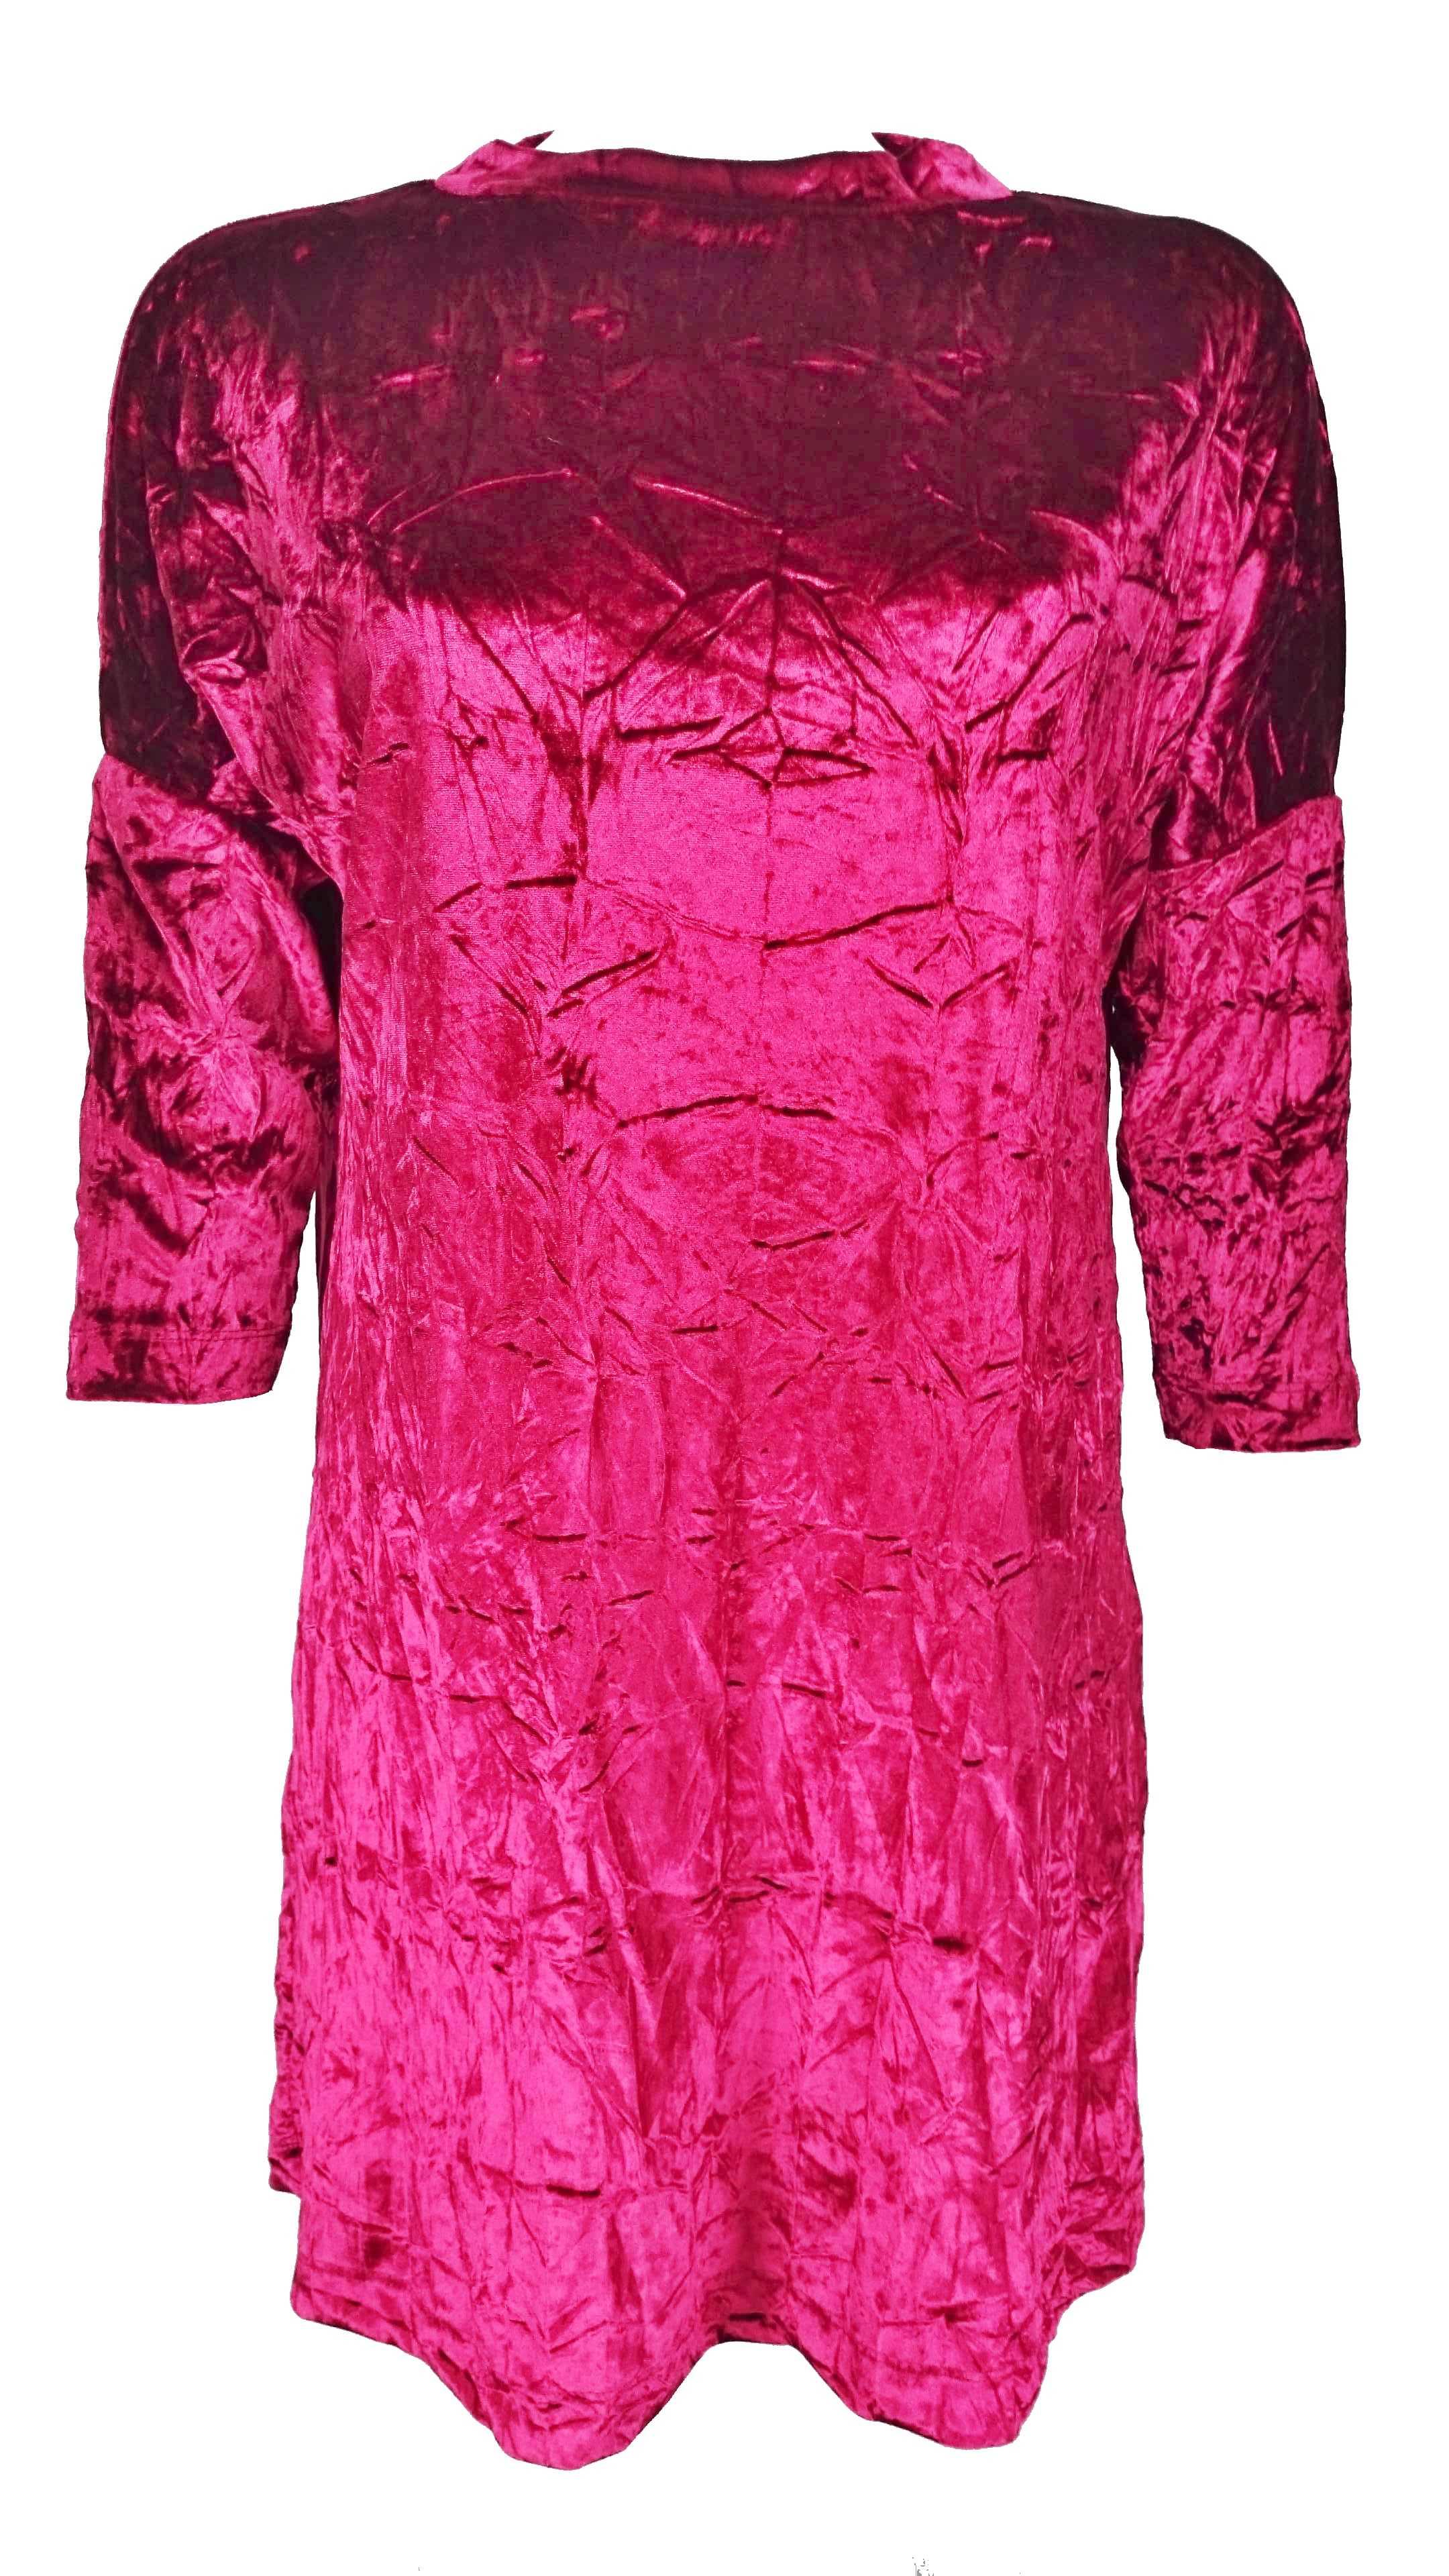 9b453c7e4891 Zara Basic ZARA dámské červené šaty - Glami.sk